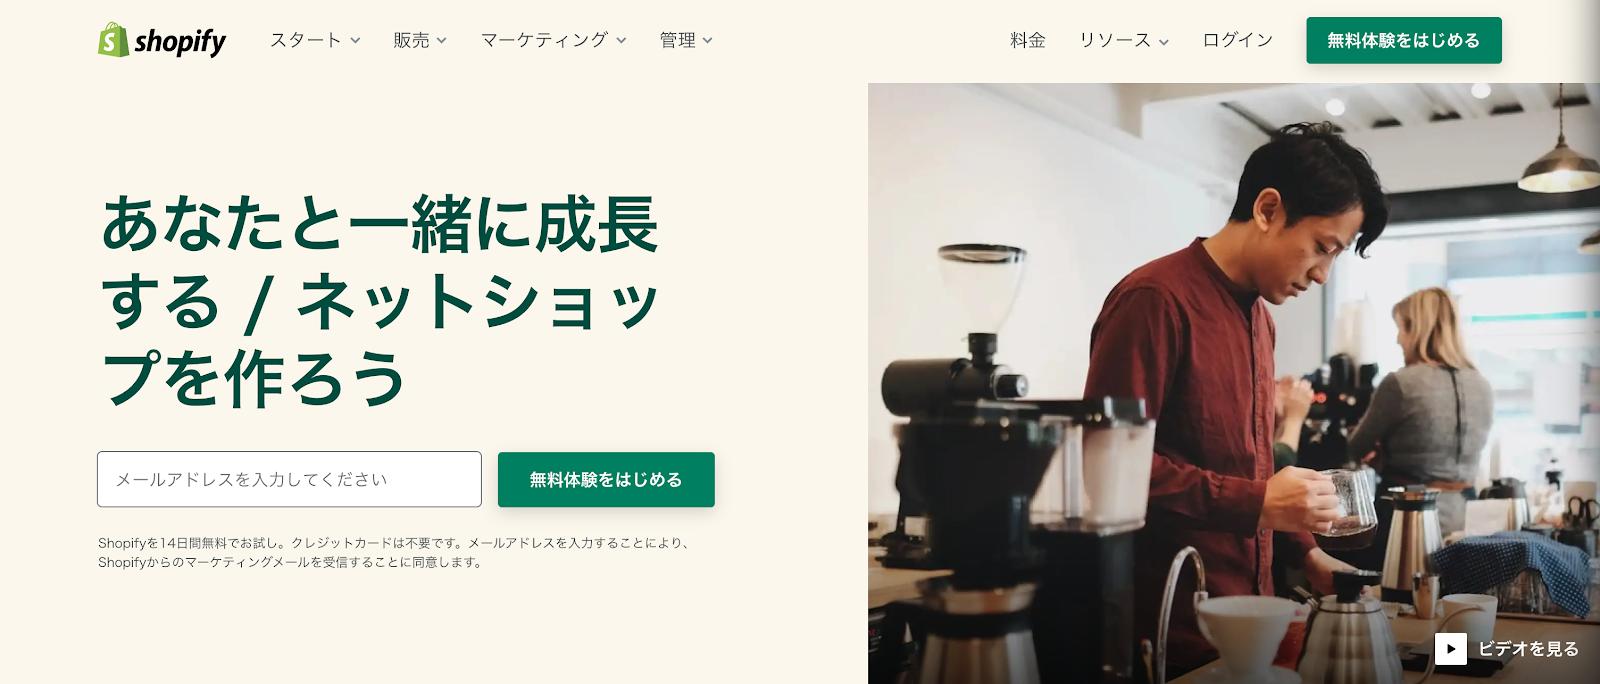 Shopify公式ページ